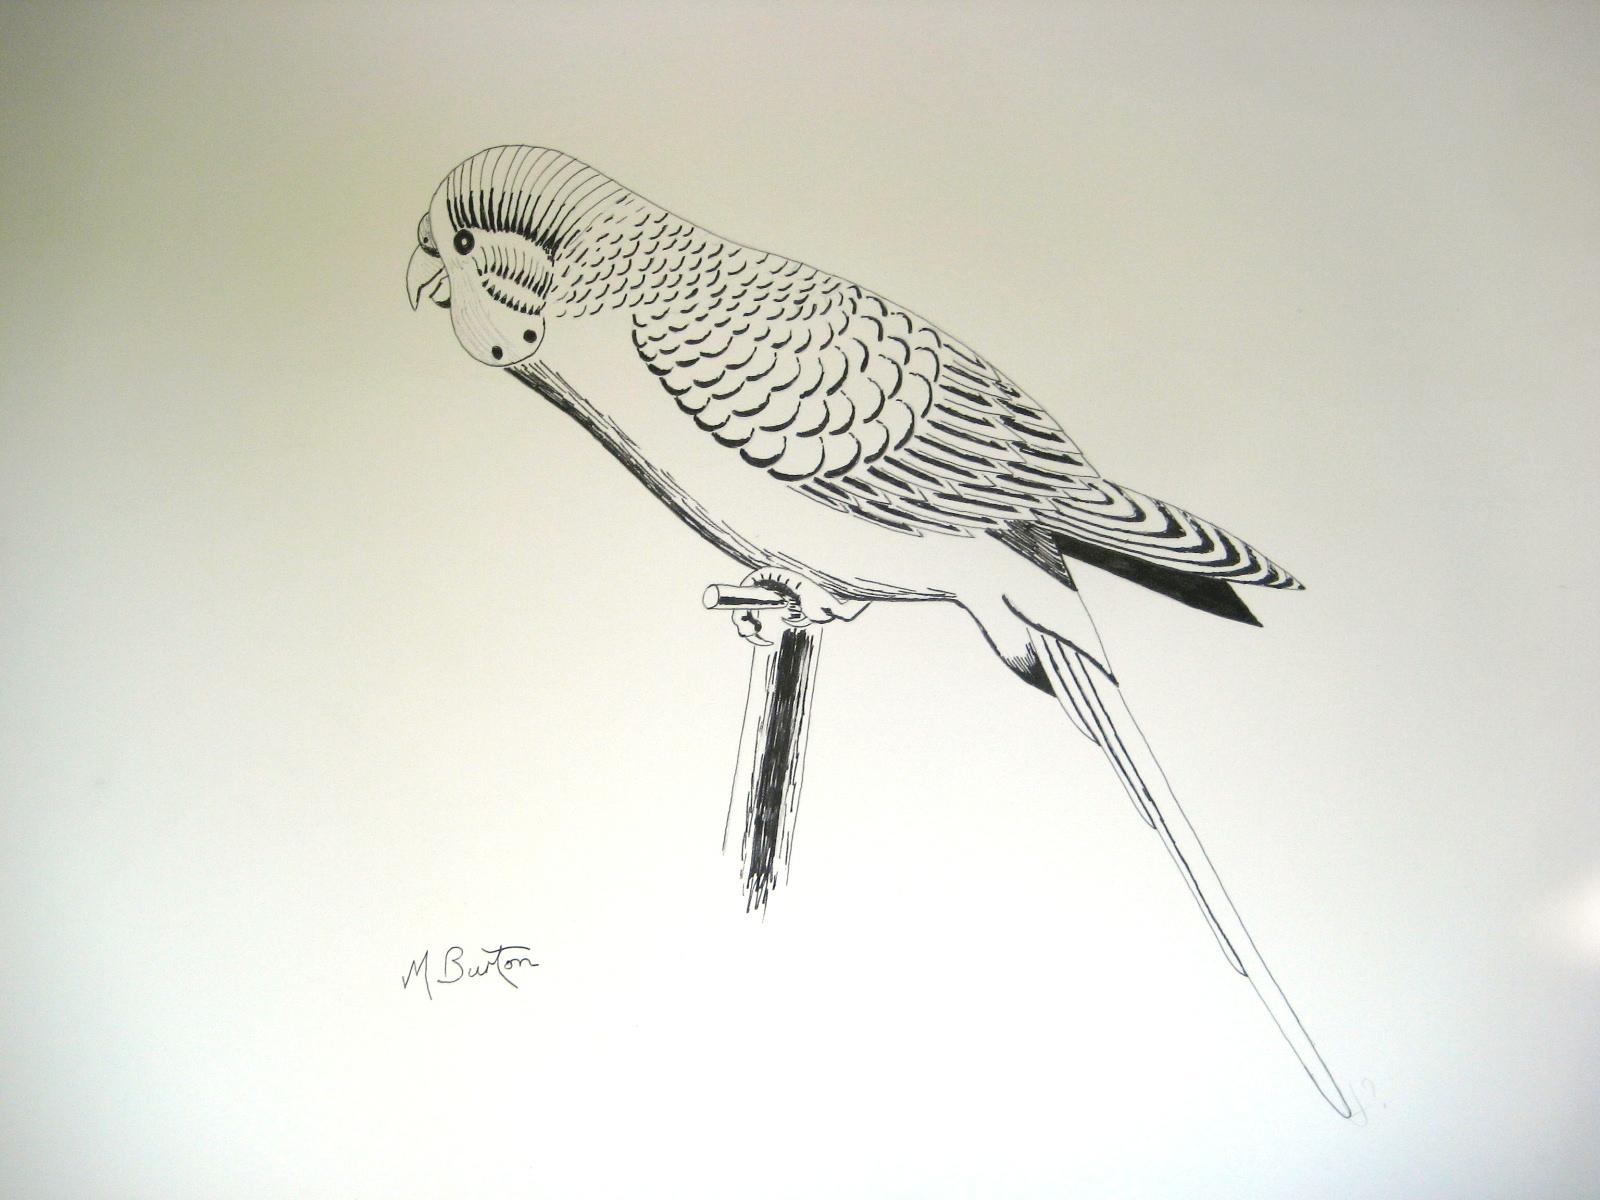 Simple Continuous Line Art : Gallery 1965 74 mick burton